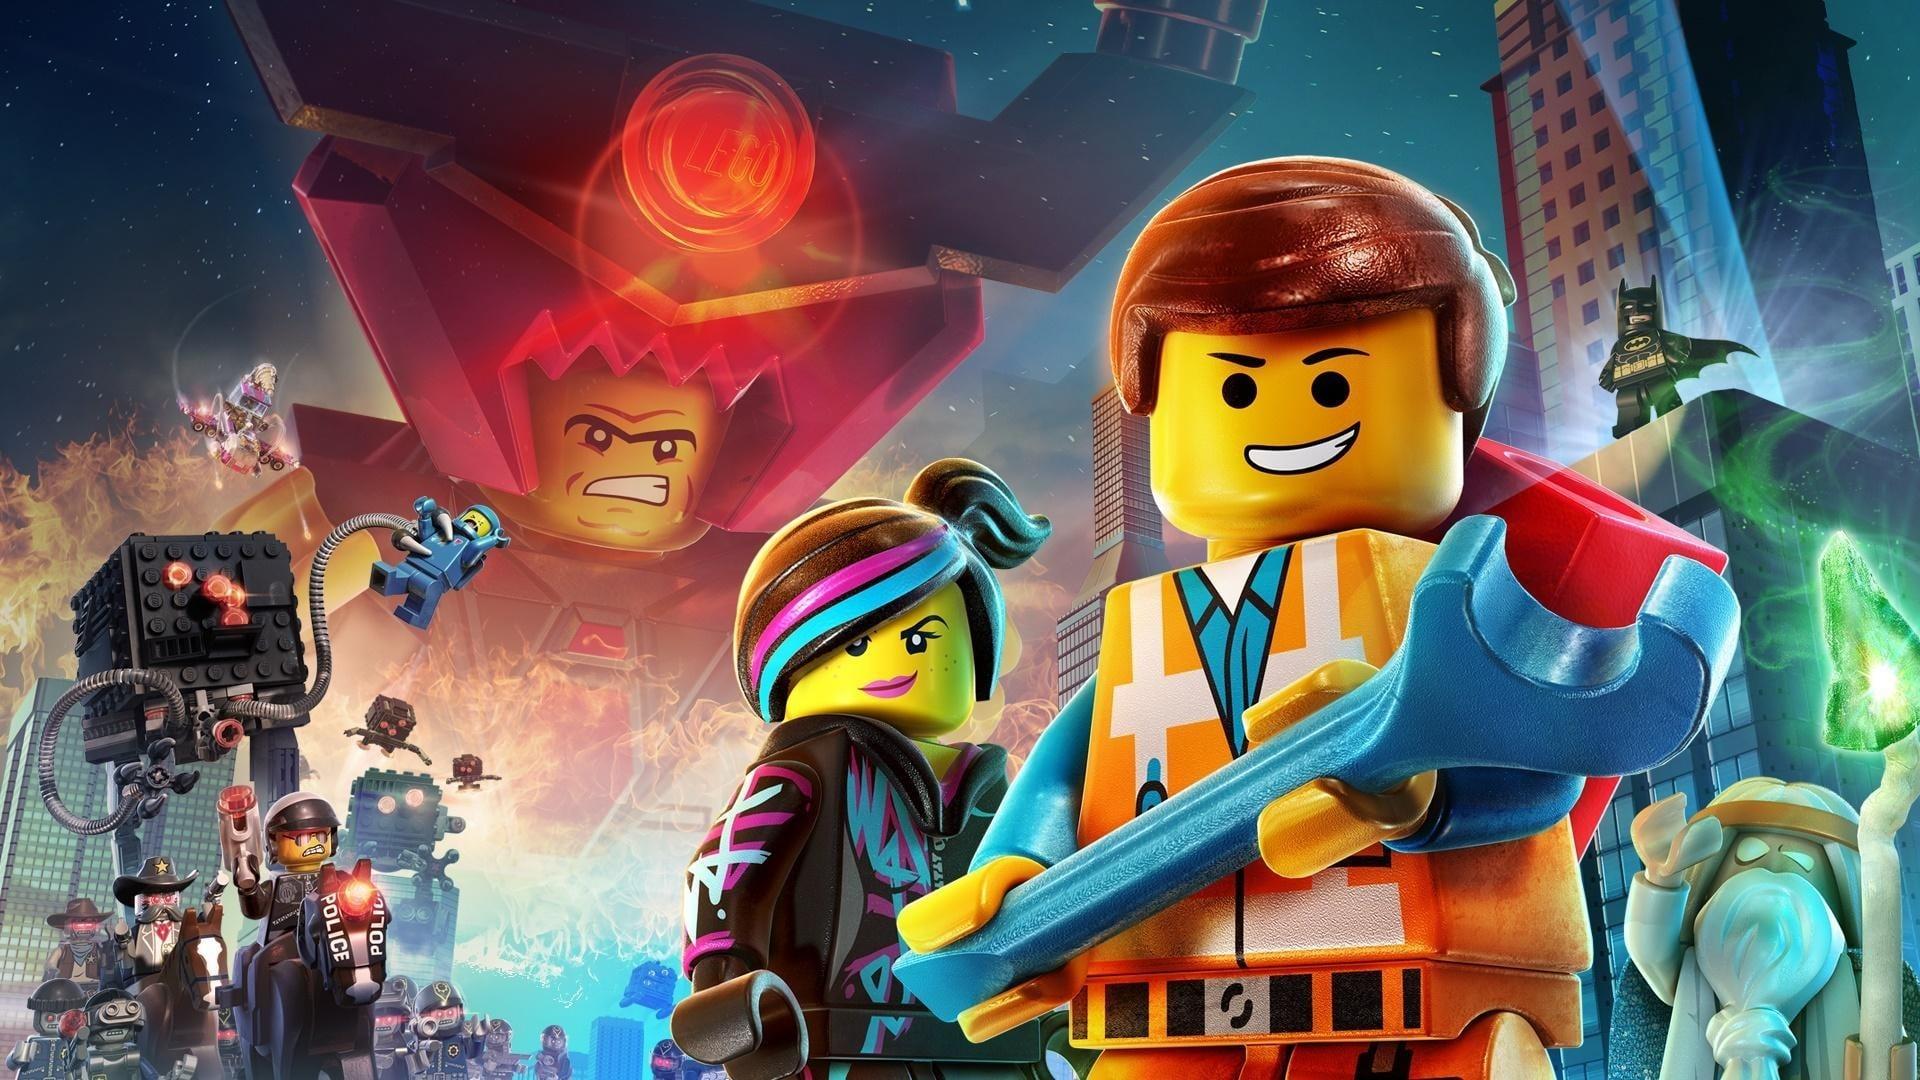 Contraportada The Lego Movie 2: The Second Part